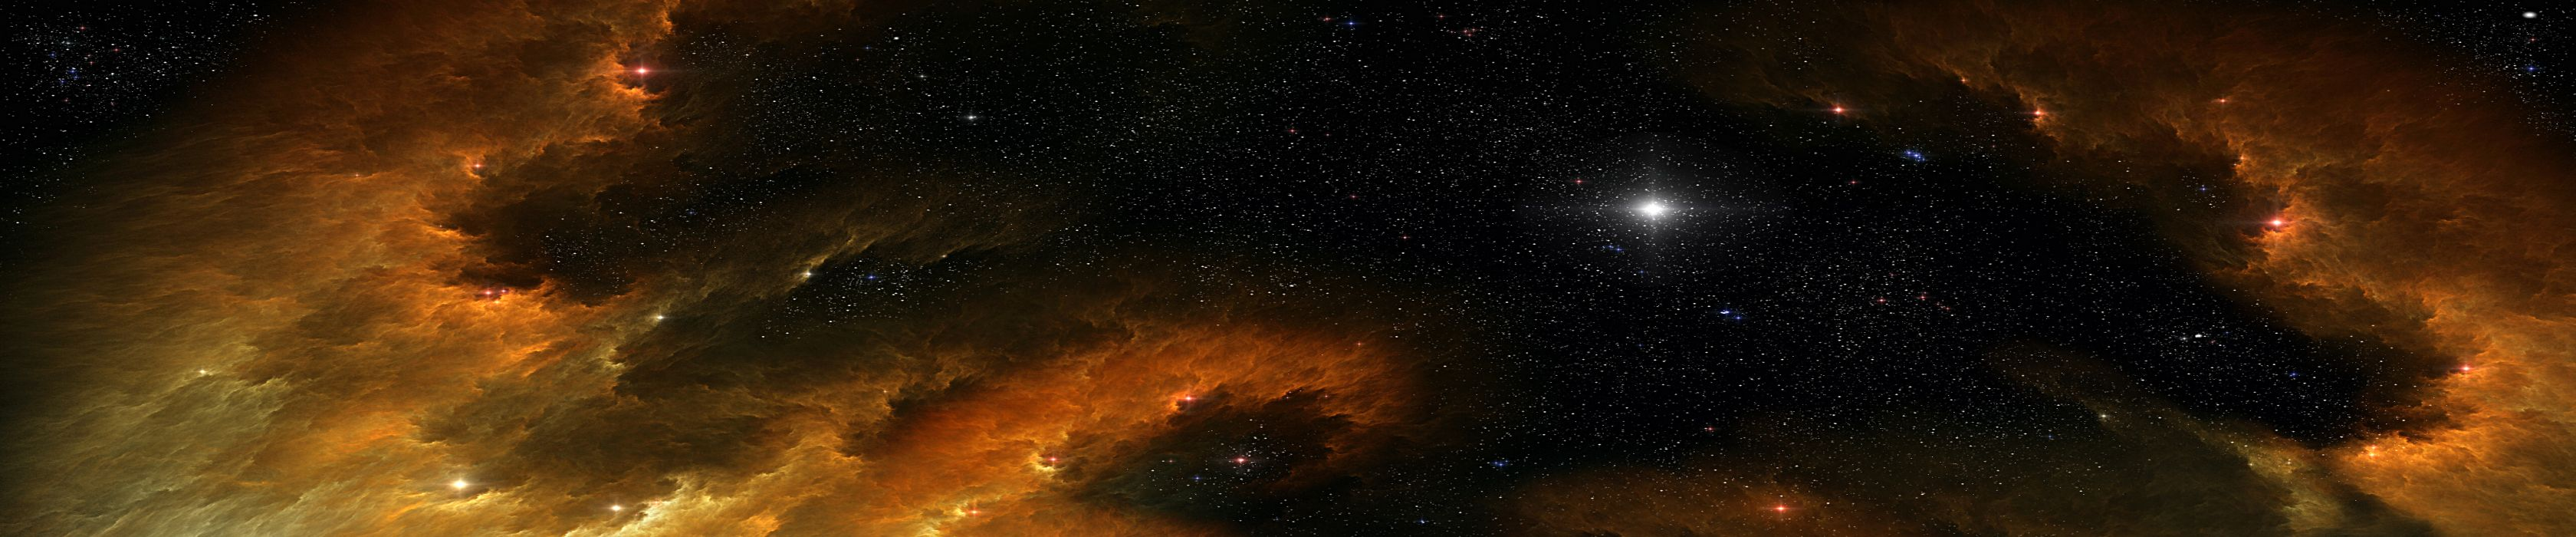 nebulae wallpaper